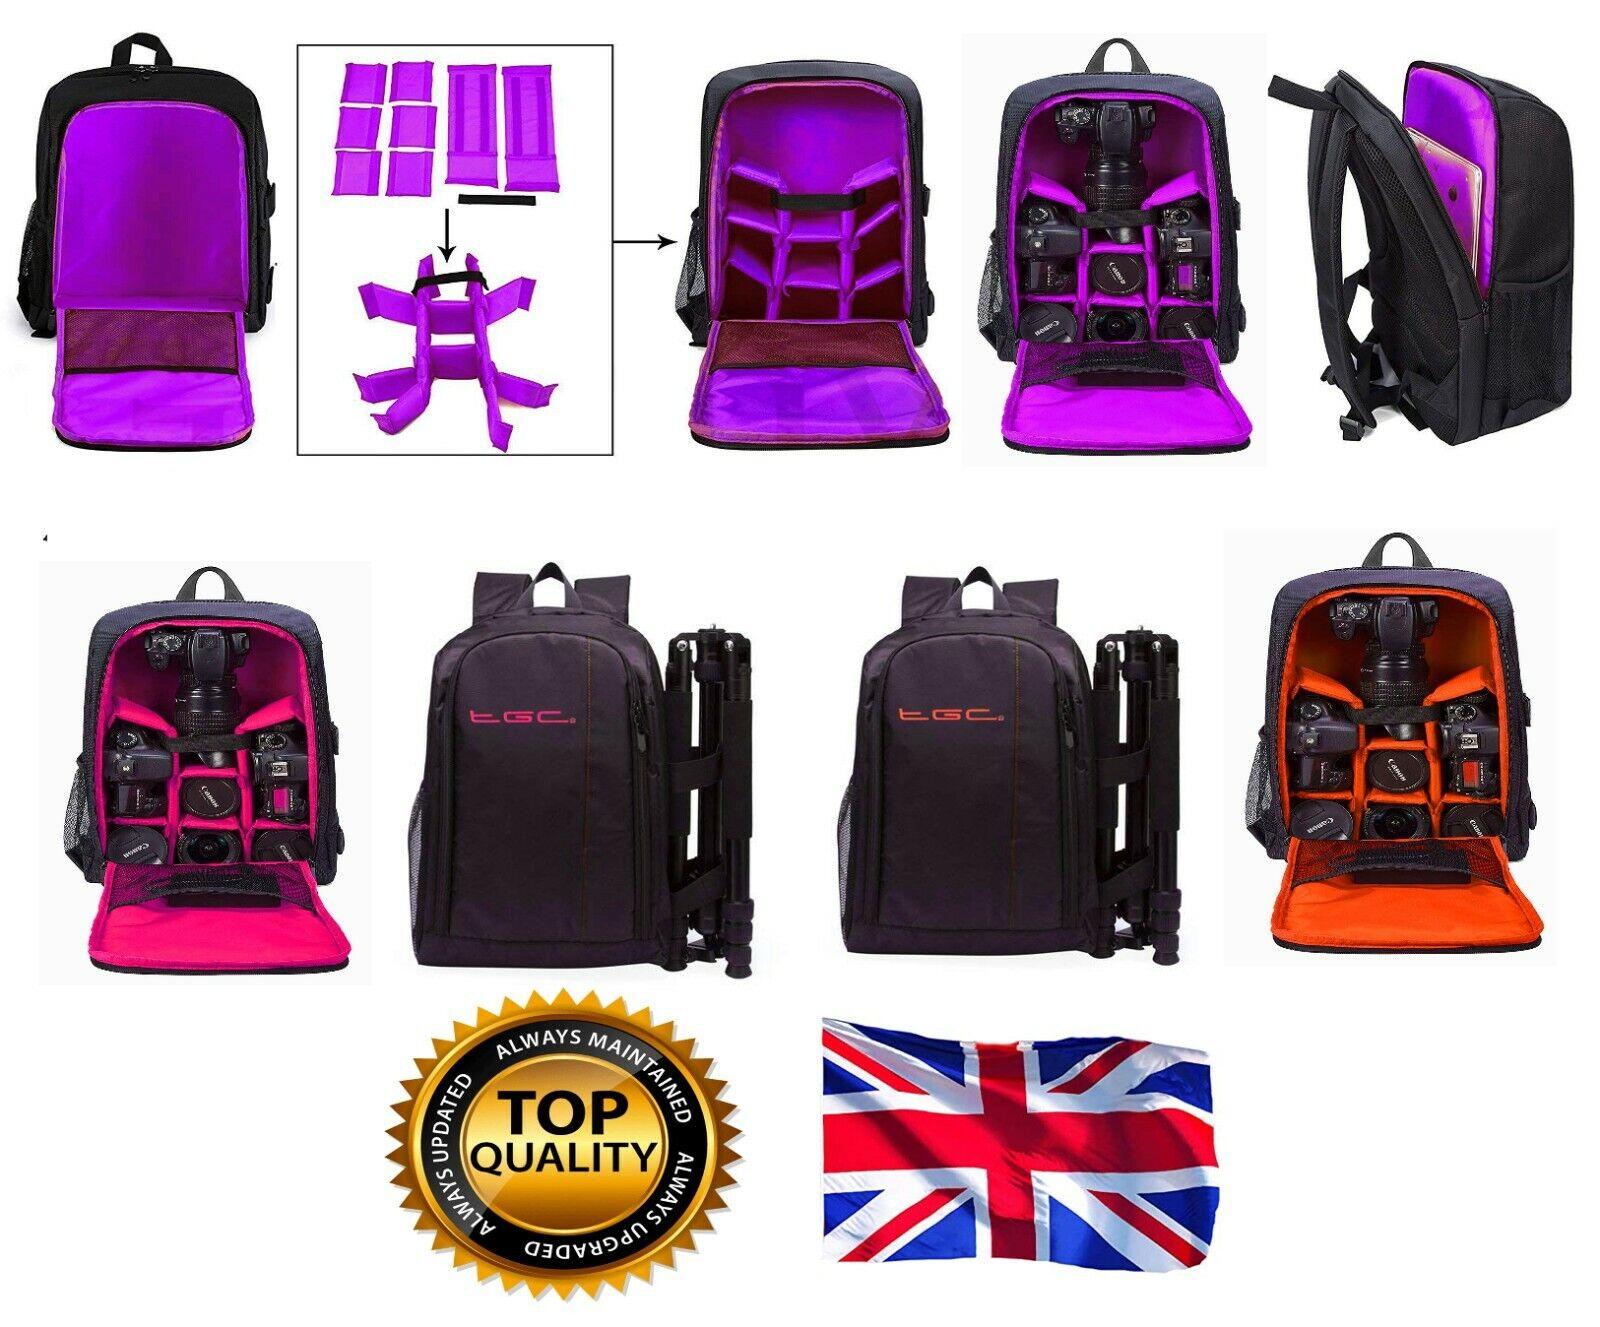 LARGE DSLR SLR Camera Bag Backpack Rucksack for Nikon Canon Sony Pentax W/Proof